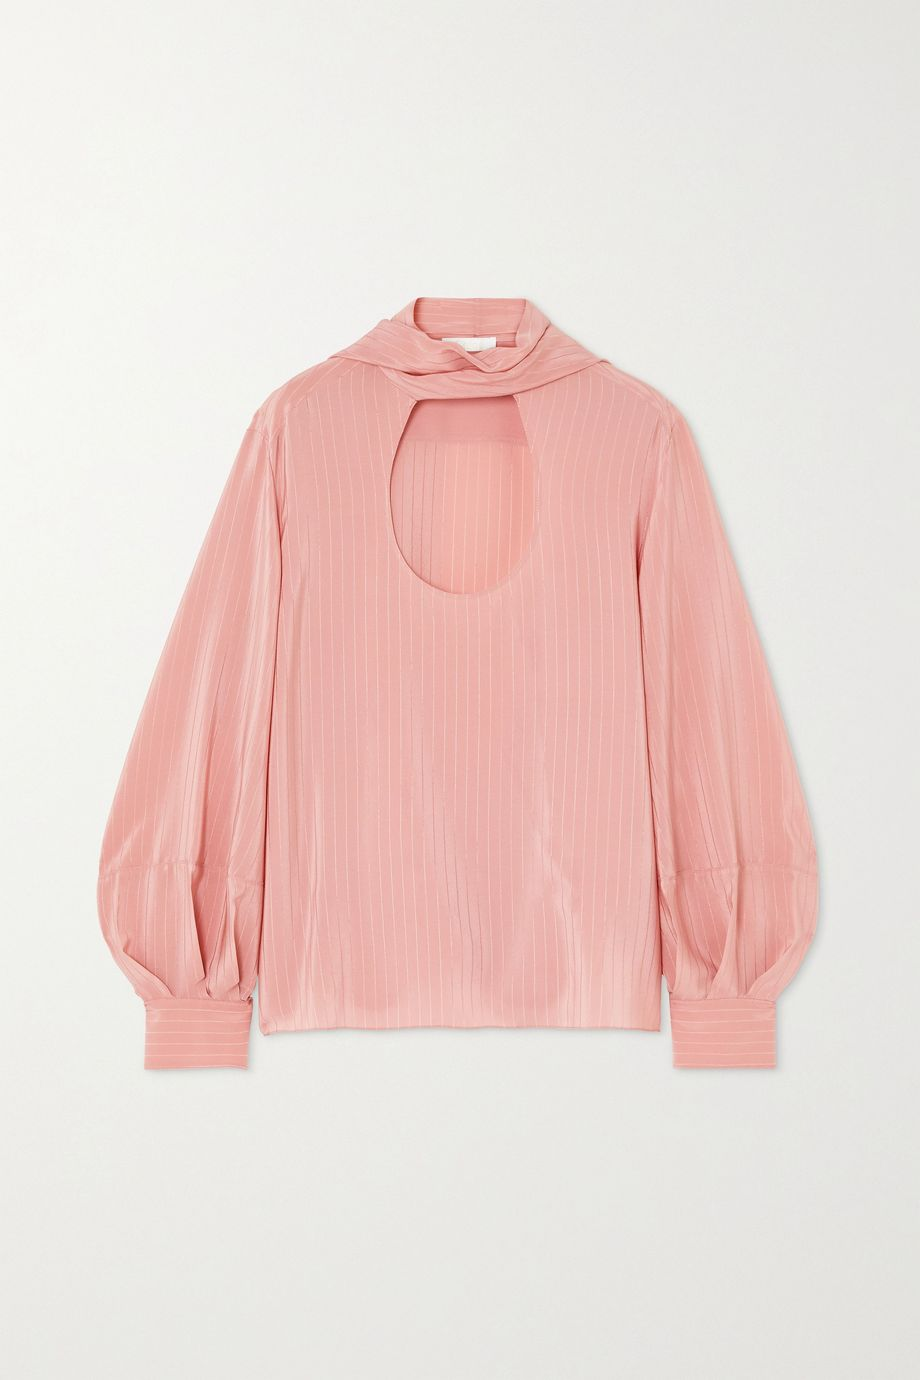 Chloé Tie-neck pinstriped silk blouse